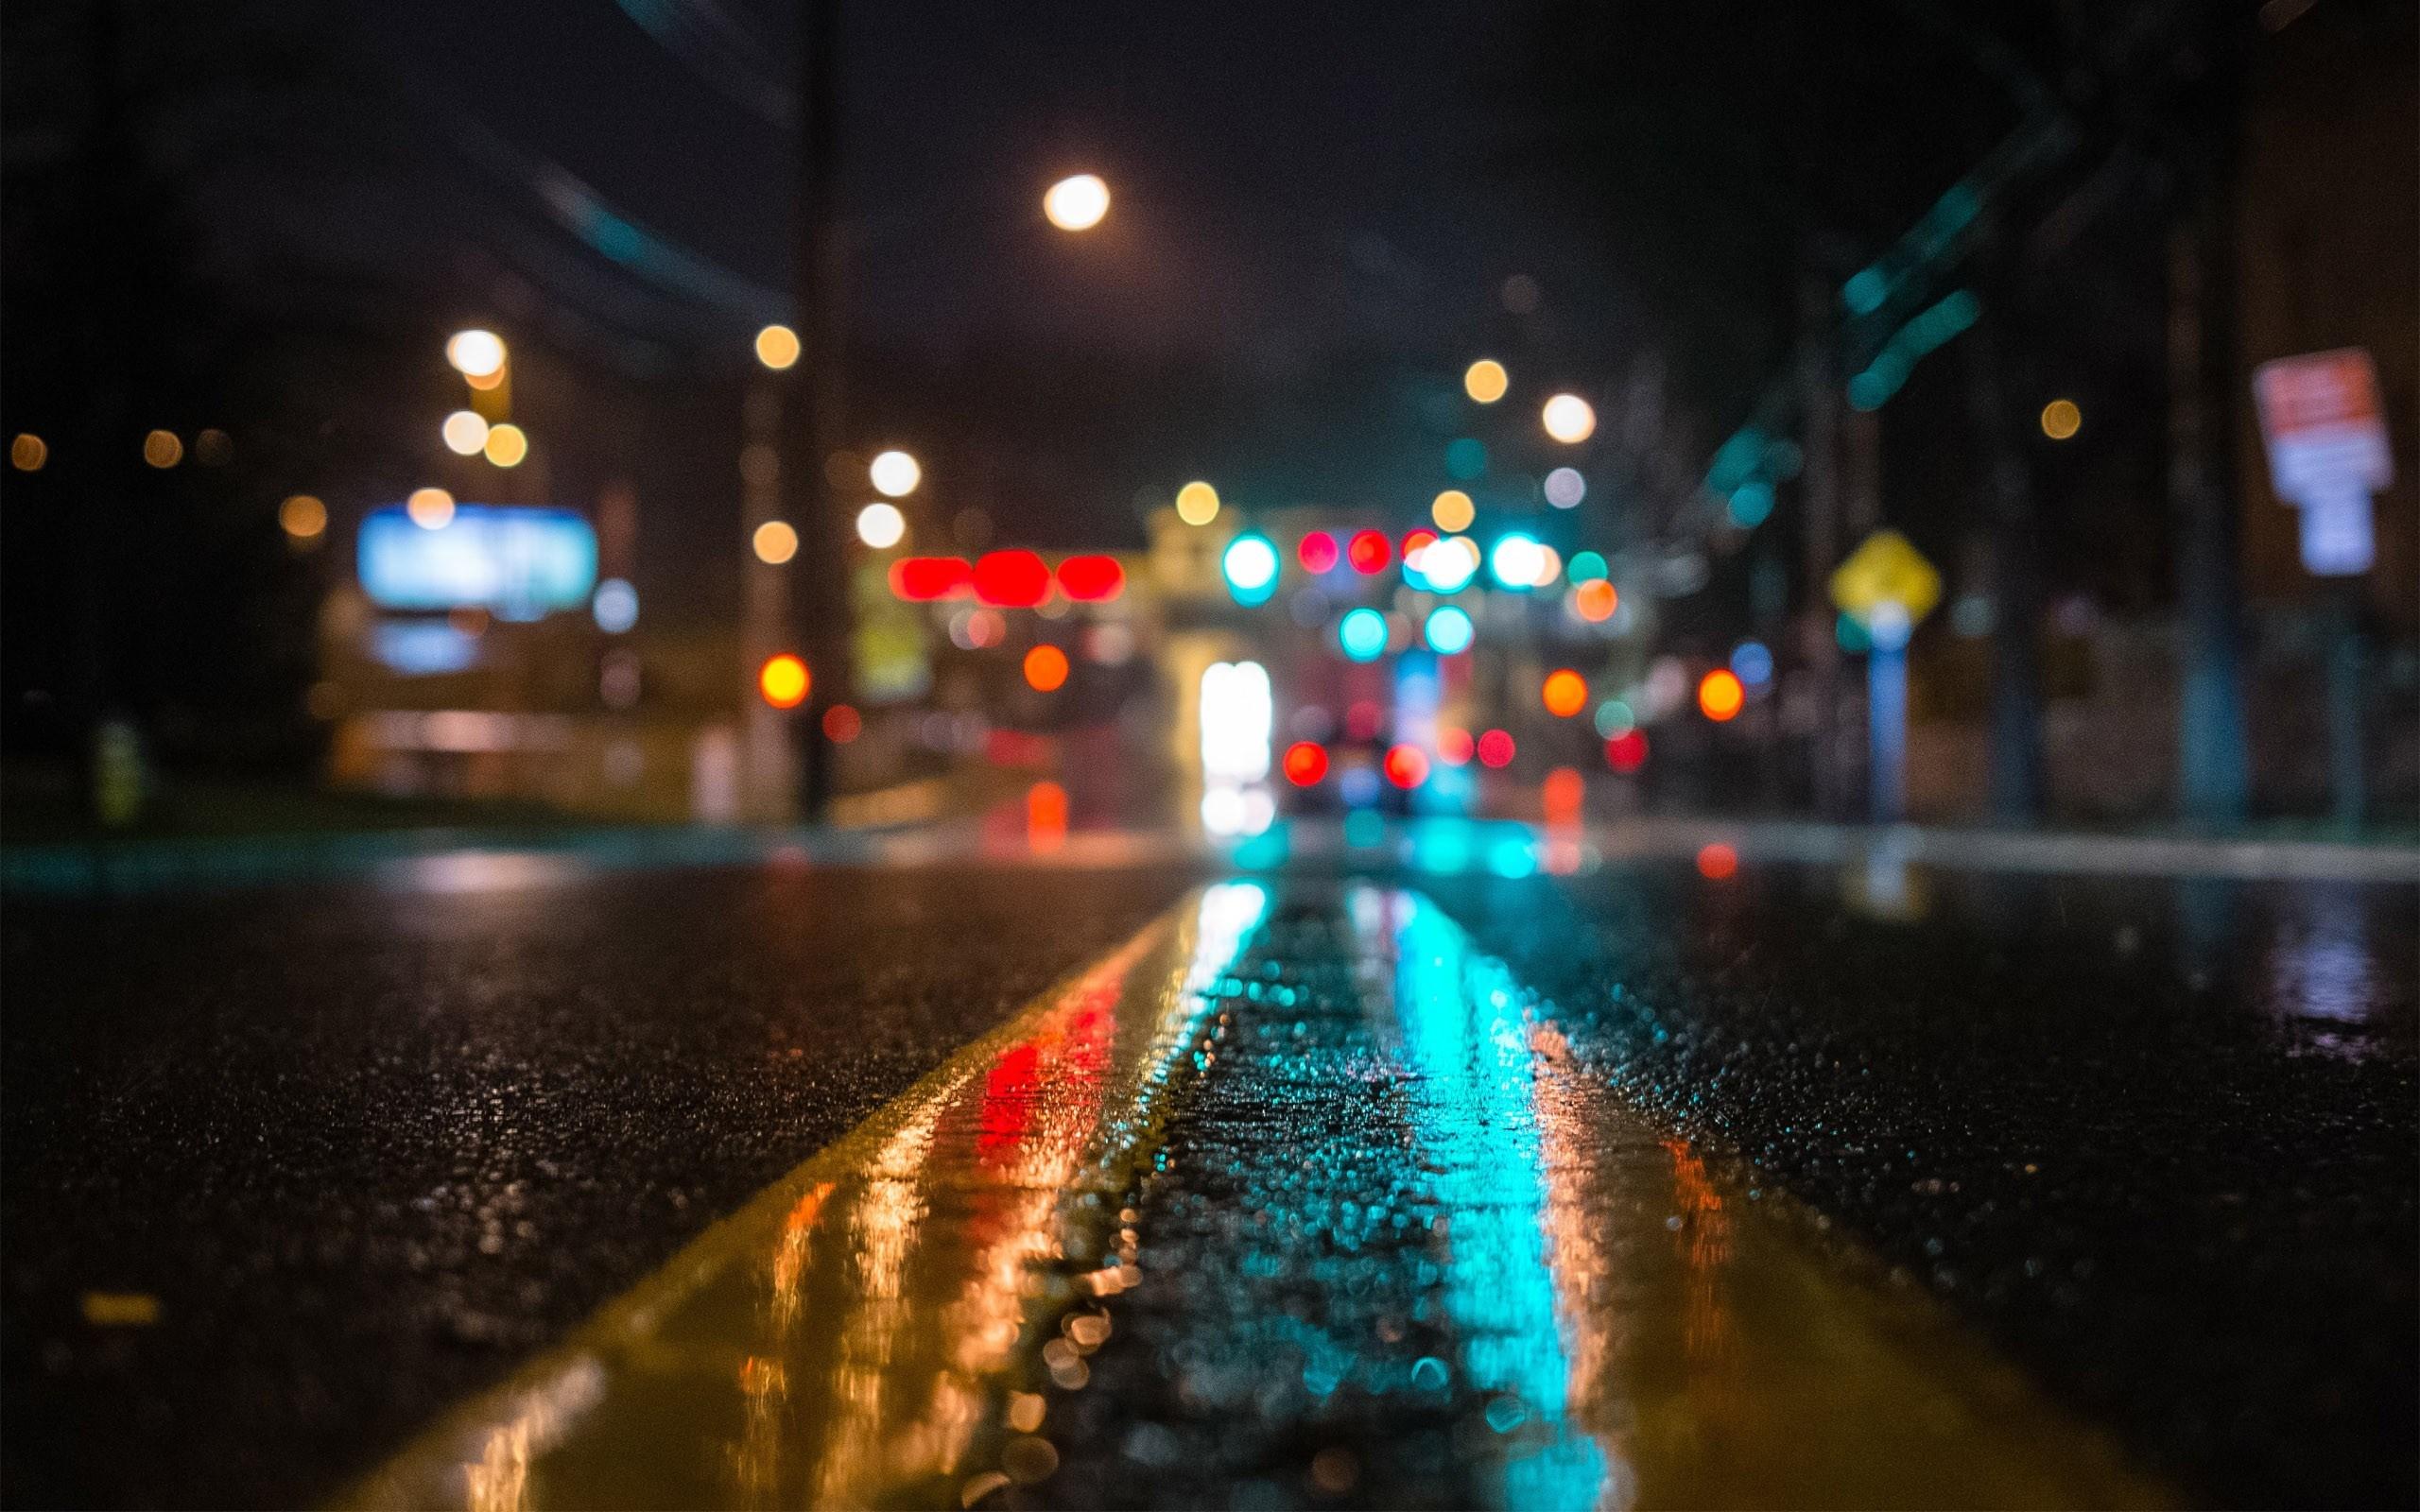 New York City Street Night Lights Hd Wallpaper